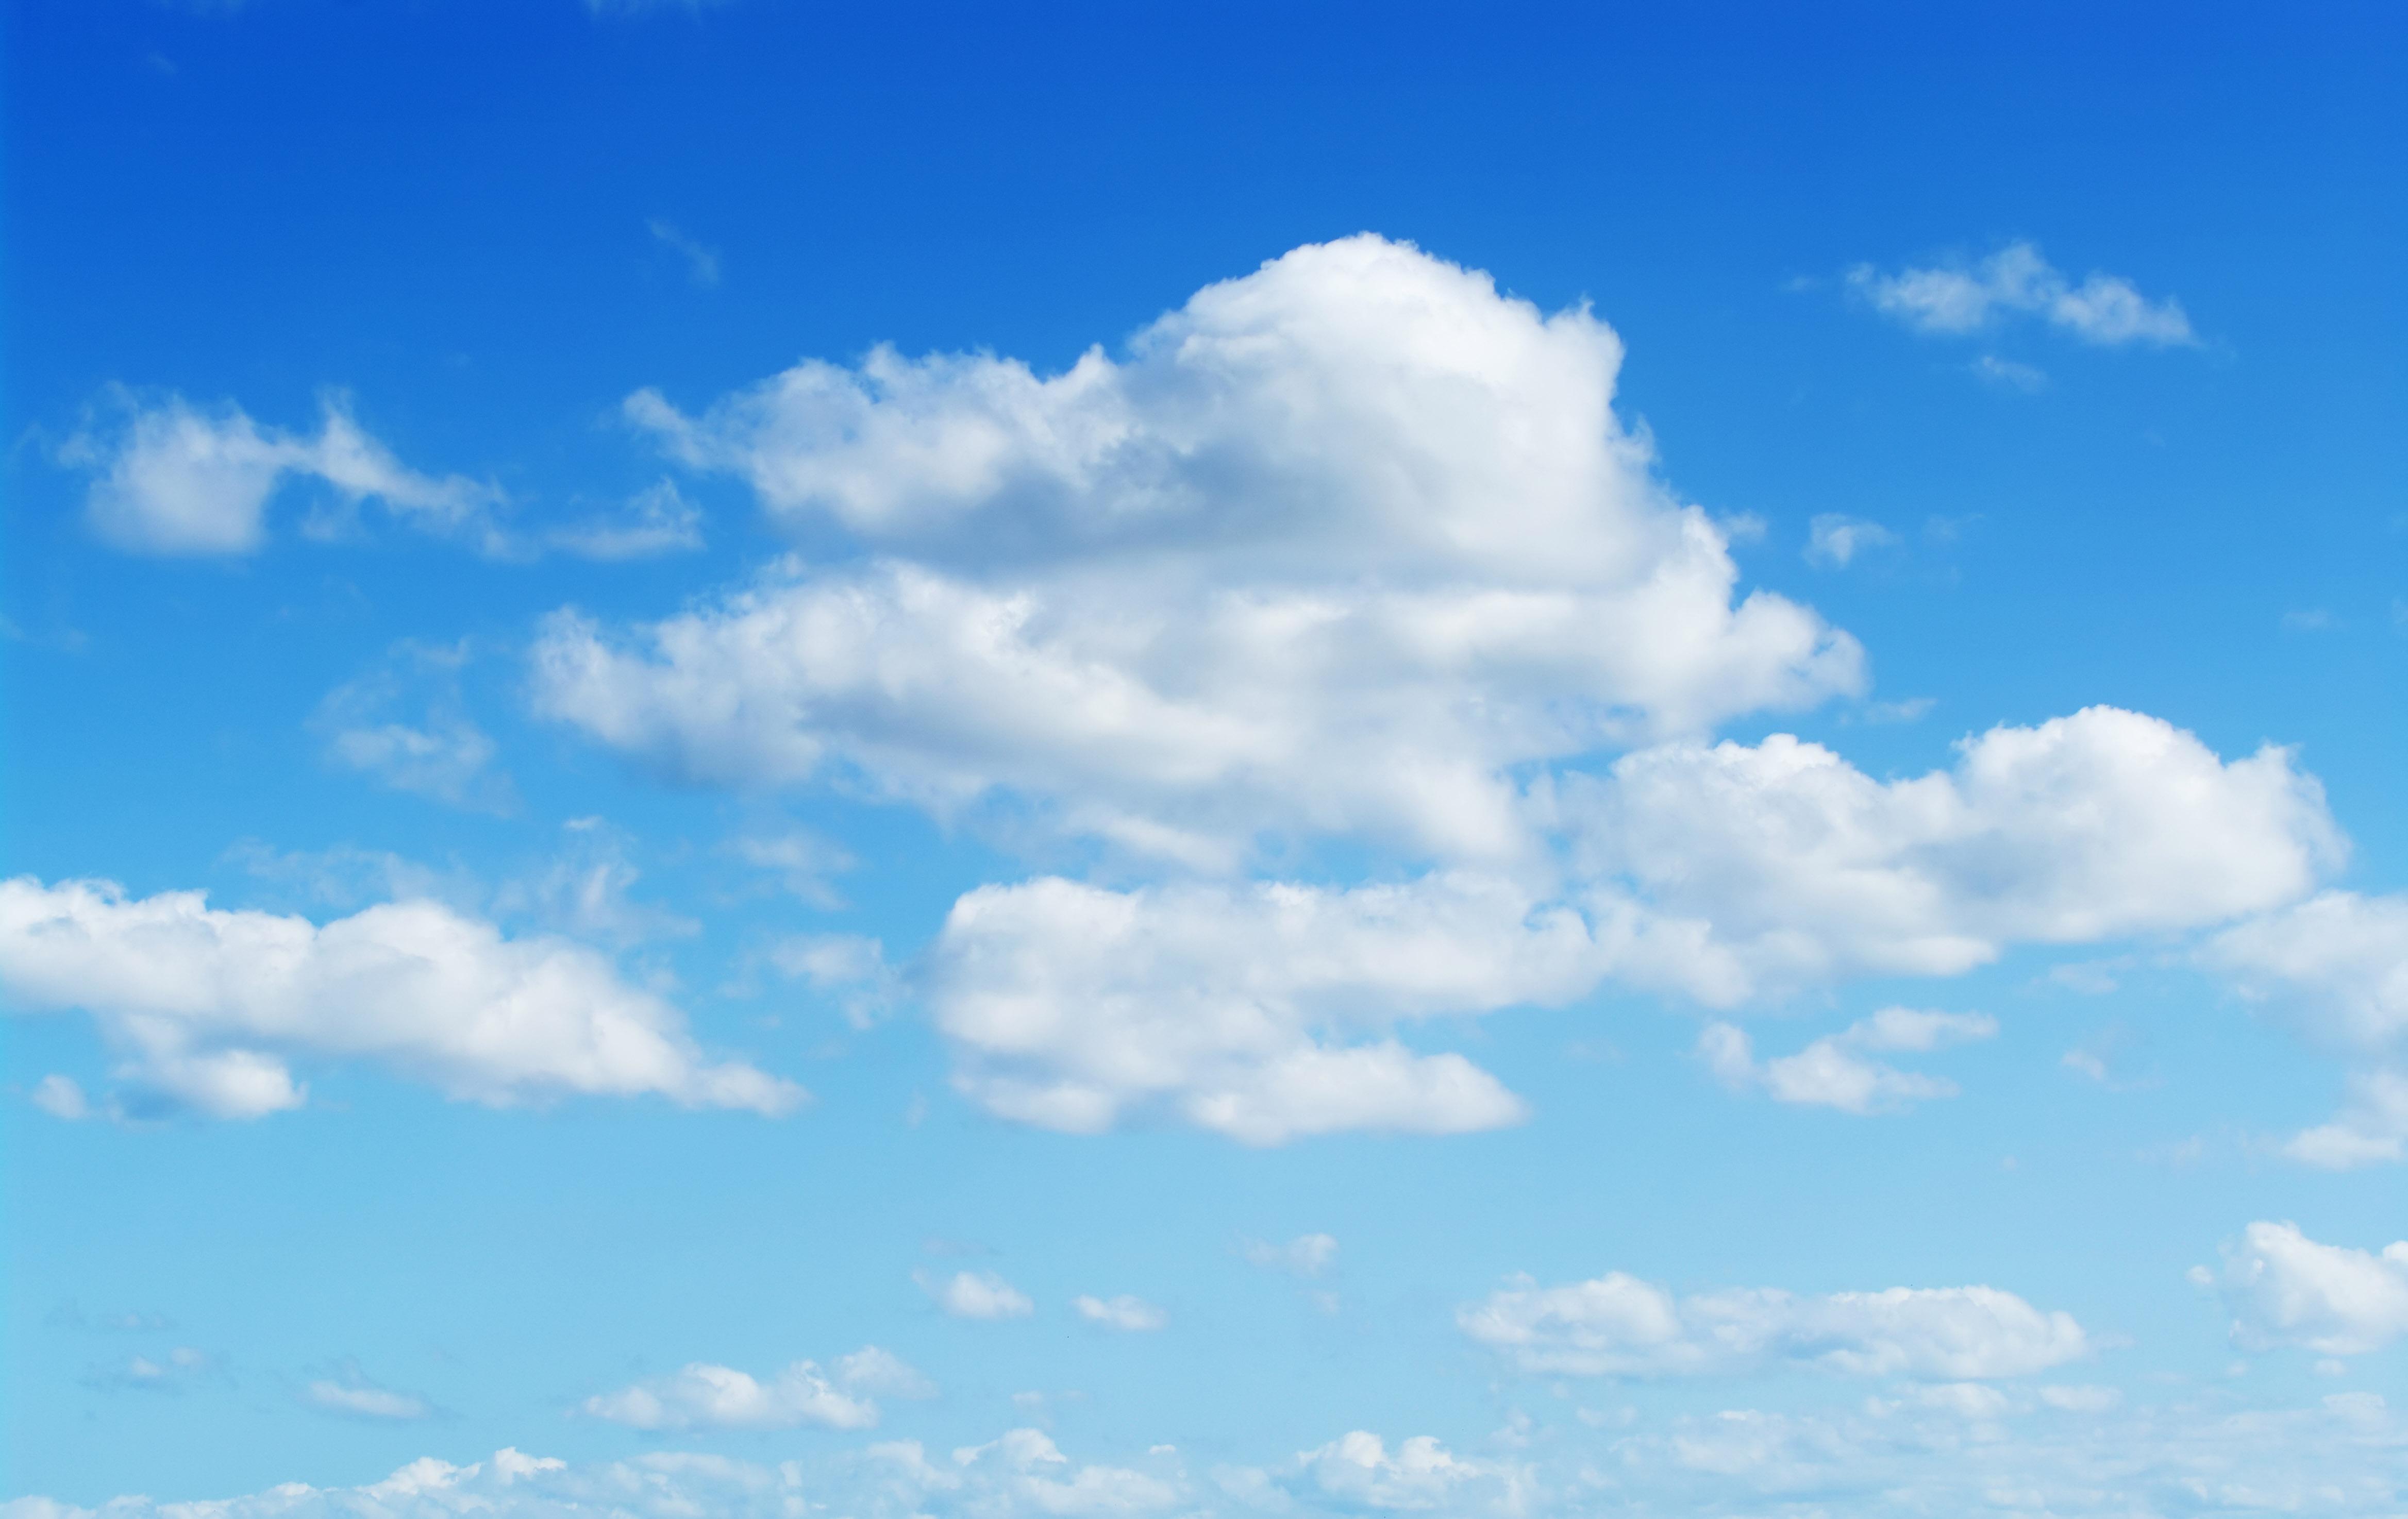 Sky Image 9403  Hdwpro